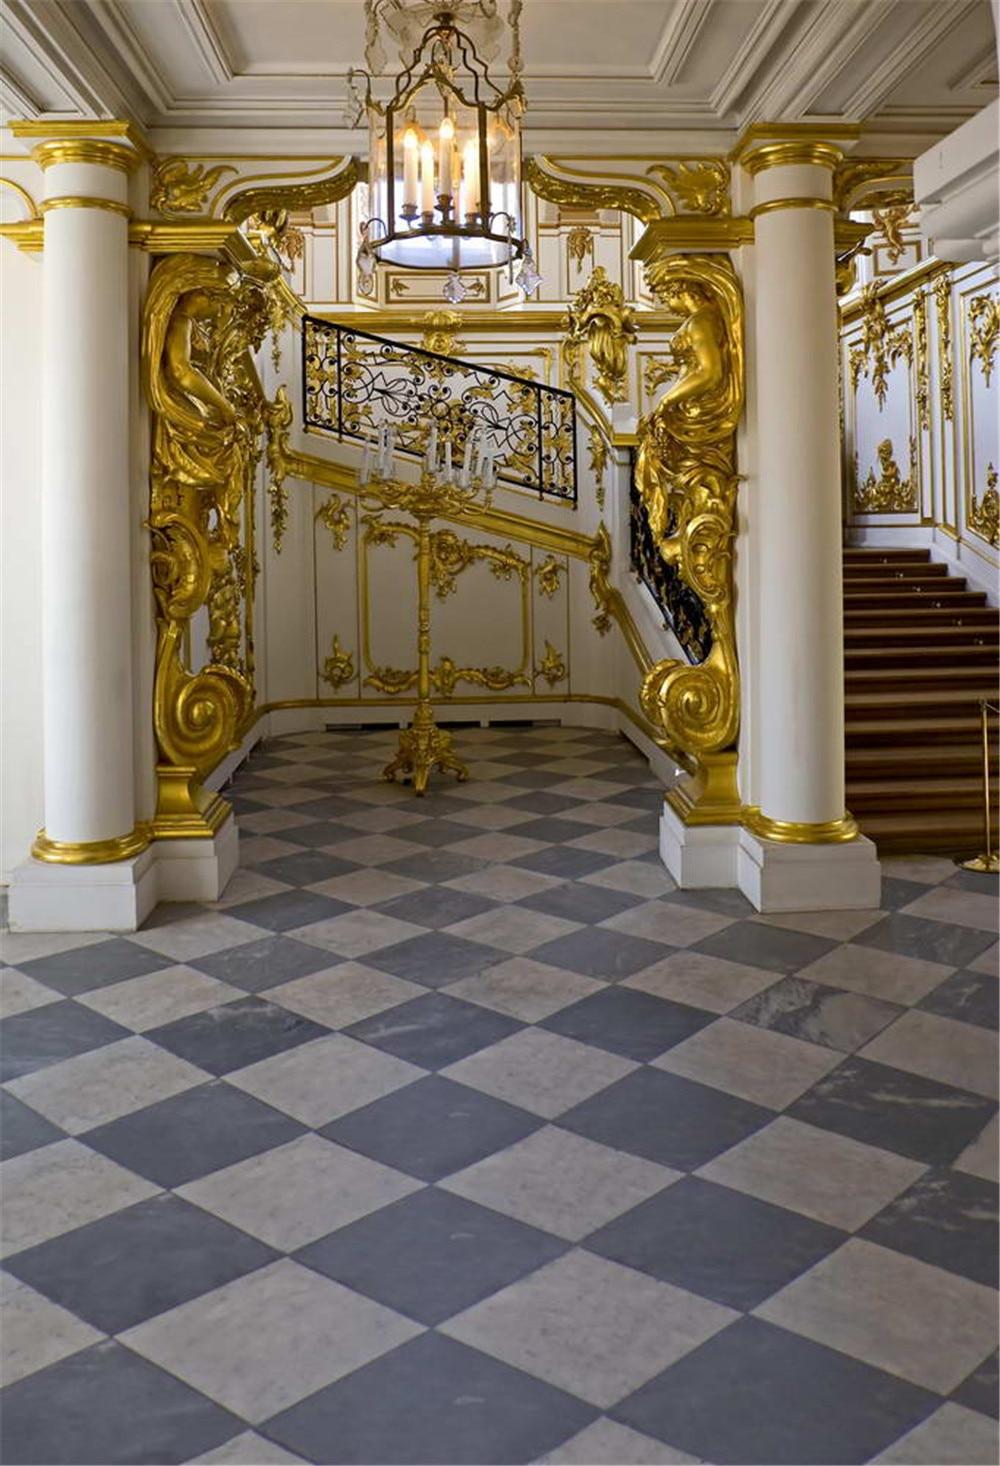 Interior Palace Photography Backdrop Marble Floor Stairs Gold Mosaic Pillars White Wall Droplight Luxury Photo Studio Background Photo Studio Background Studio Backgroundphotography Backdrops Aliexpress